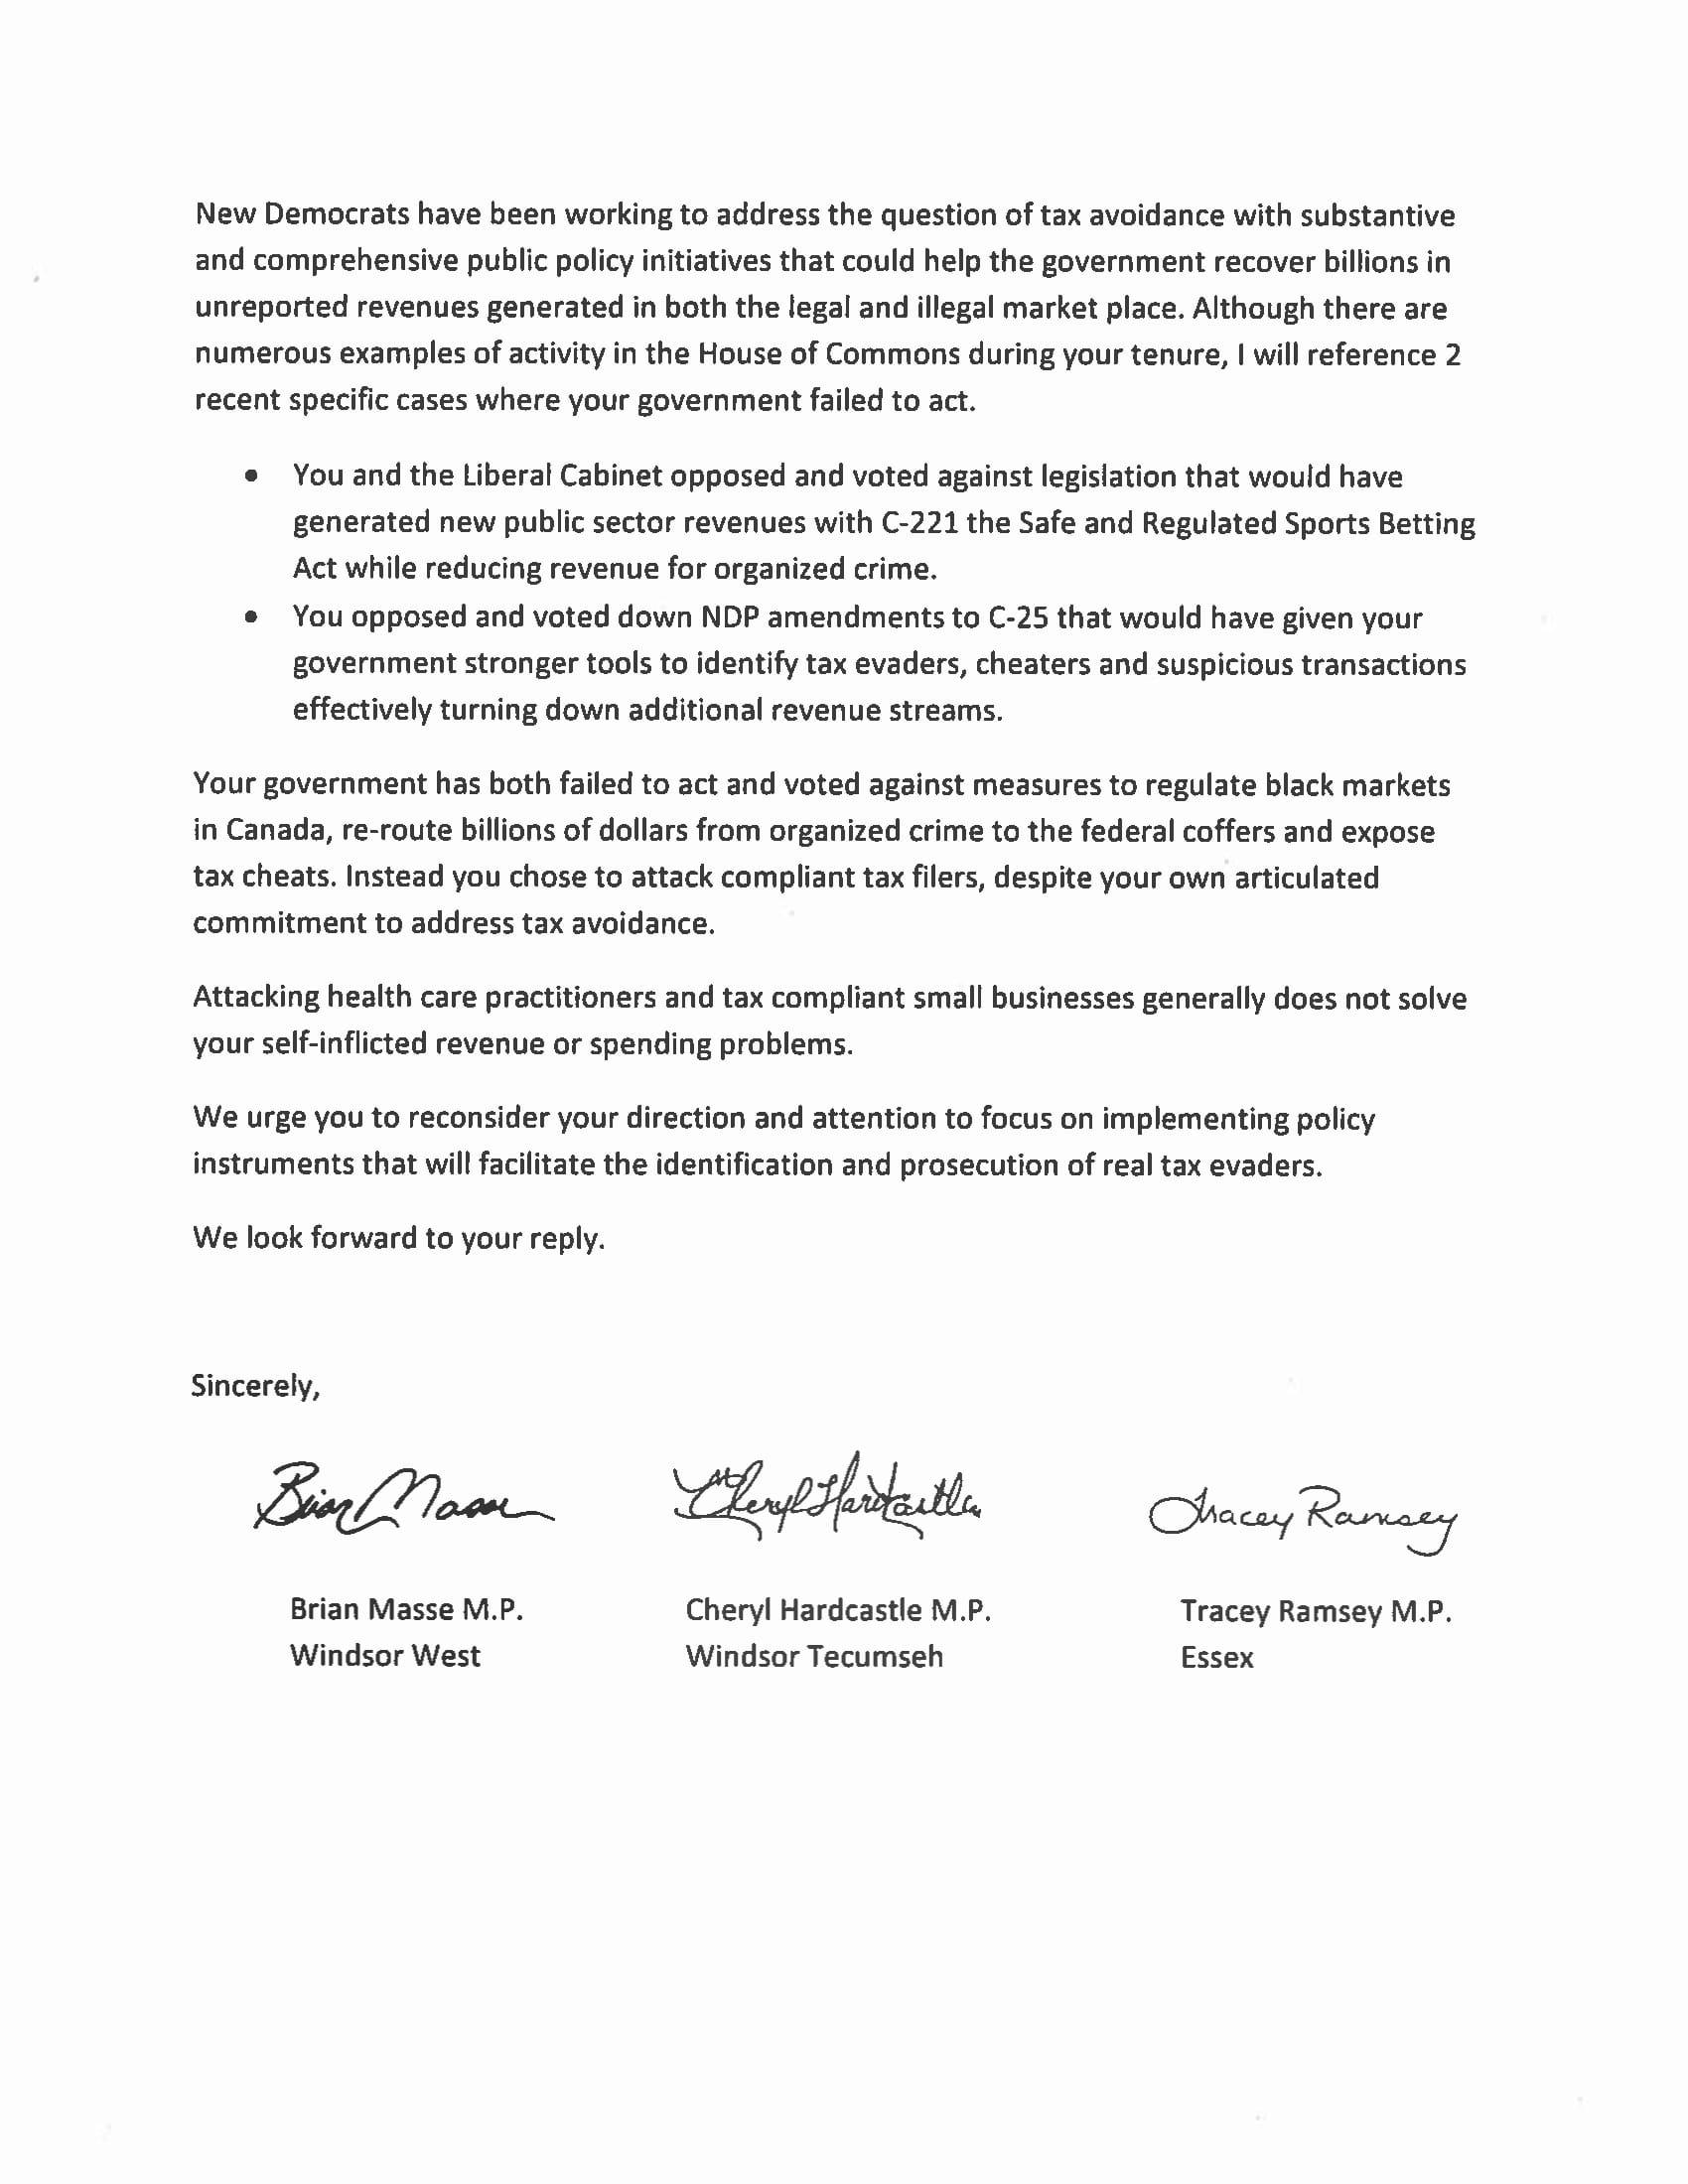 070917 Joint Letter Masse Hardcastle Ramsey to Min Morneau on Sm Biz Tax Changes-2